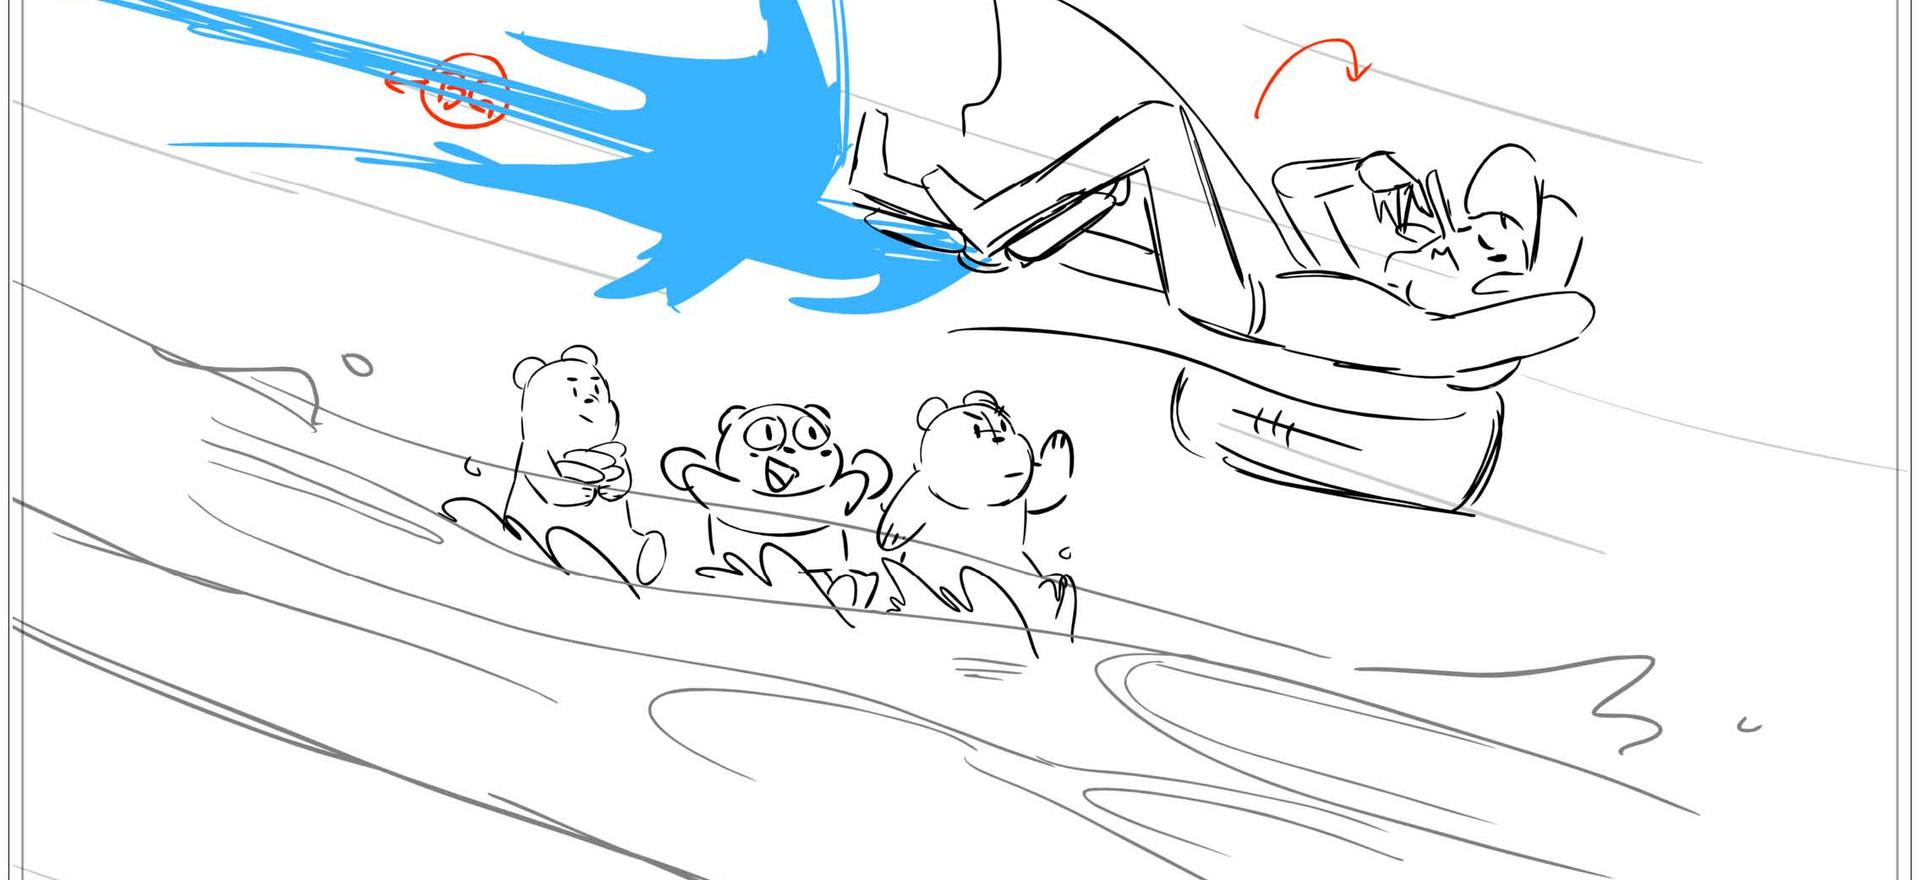 BabyBears_StoryboardTest_JodyWegner_Page